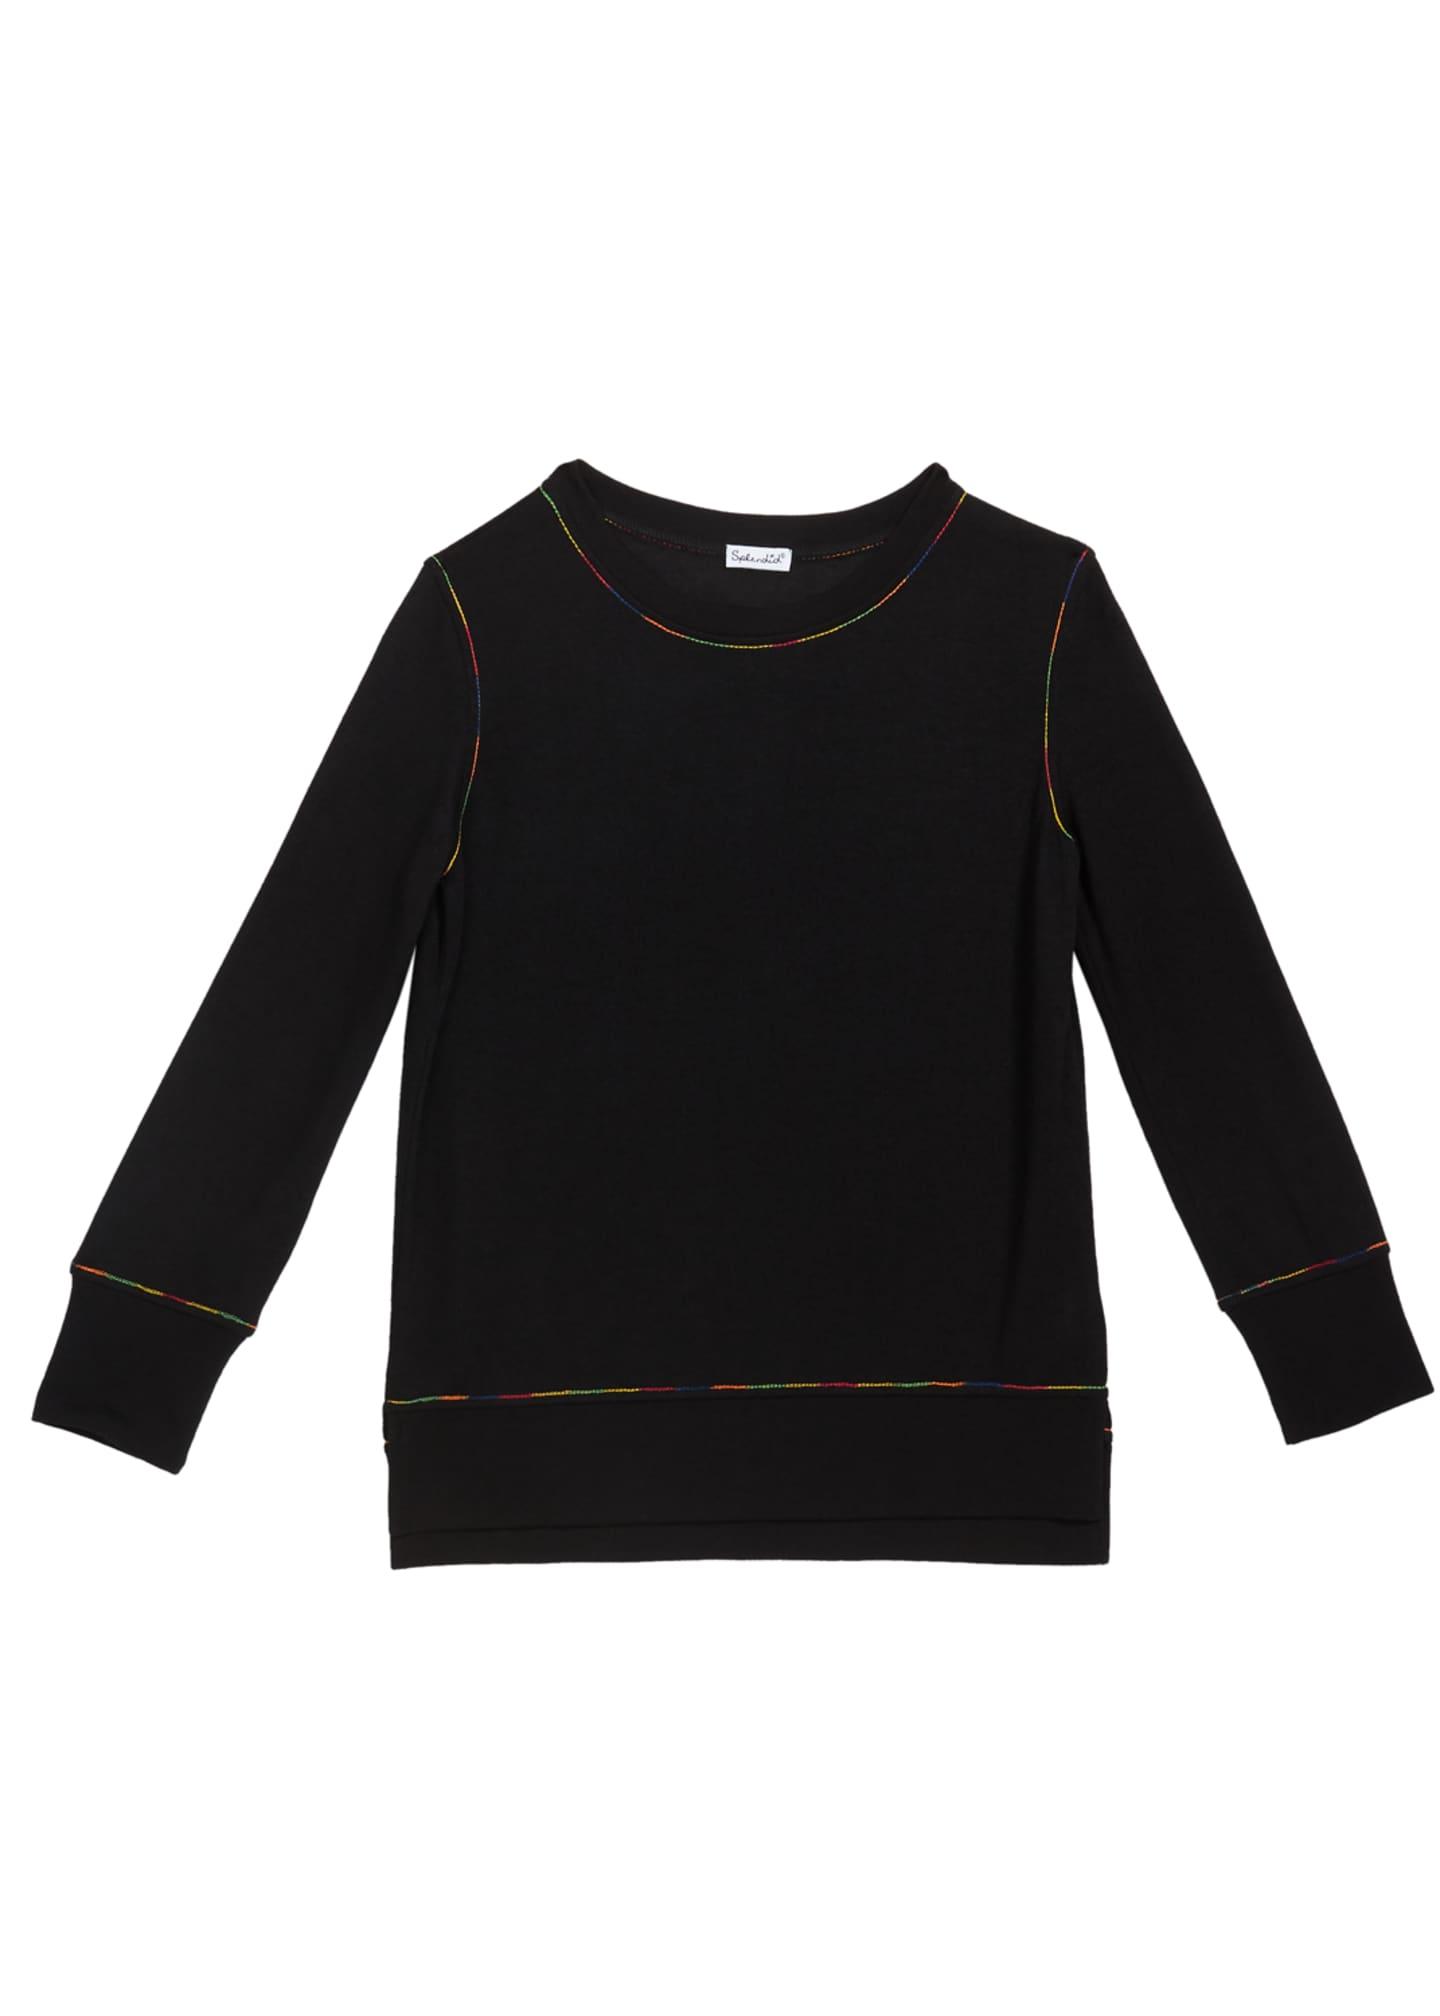 Splendid Girl's Rainbow Stitch Shirt, Size 7-14